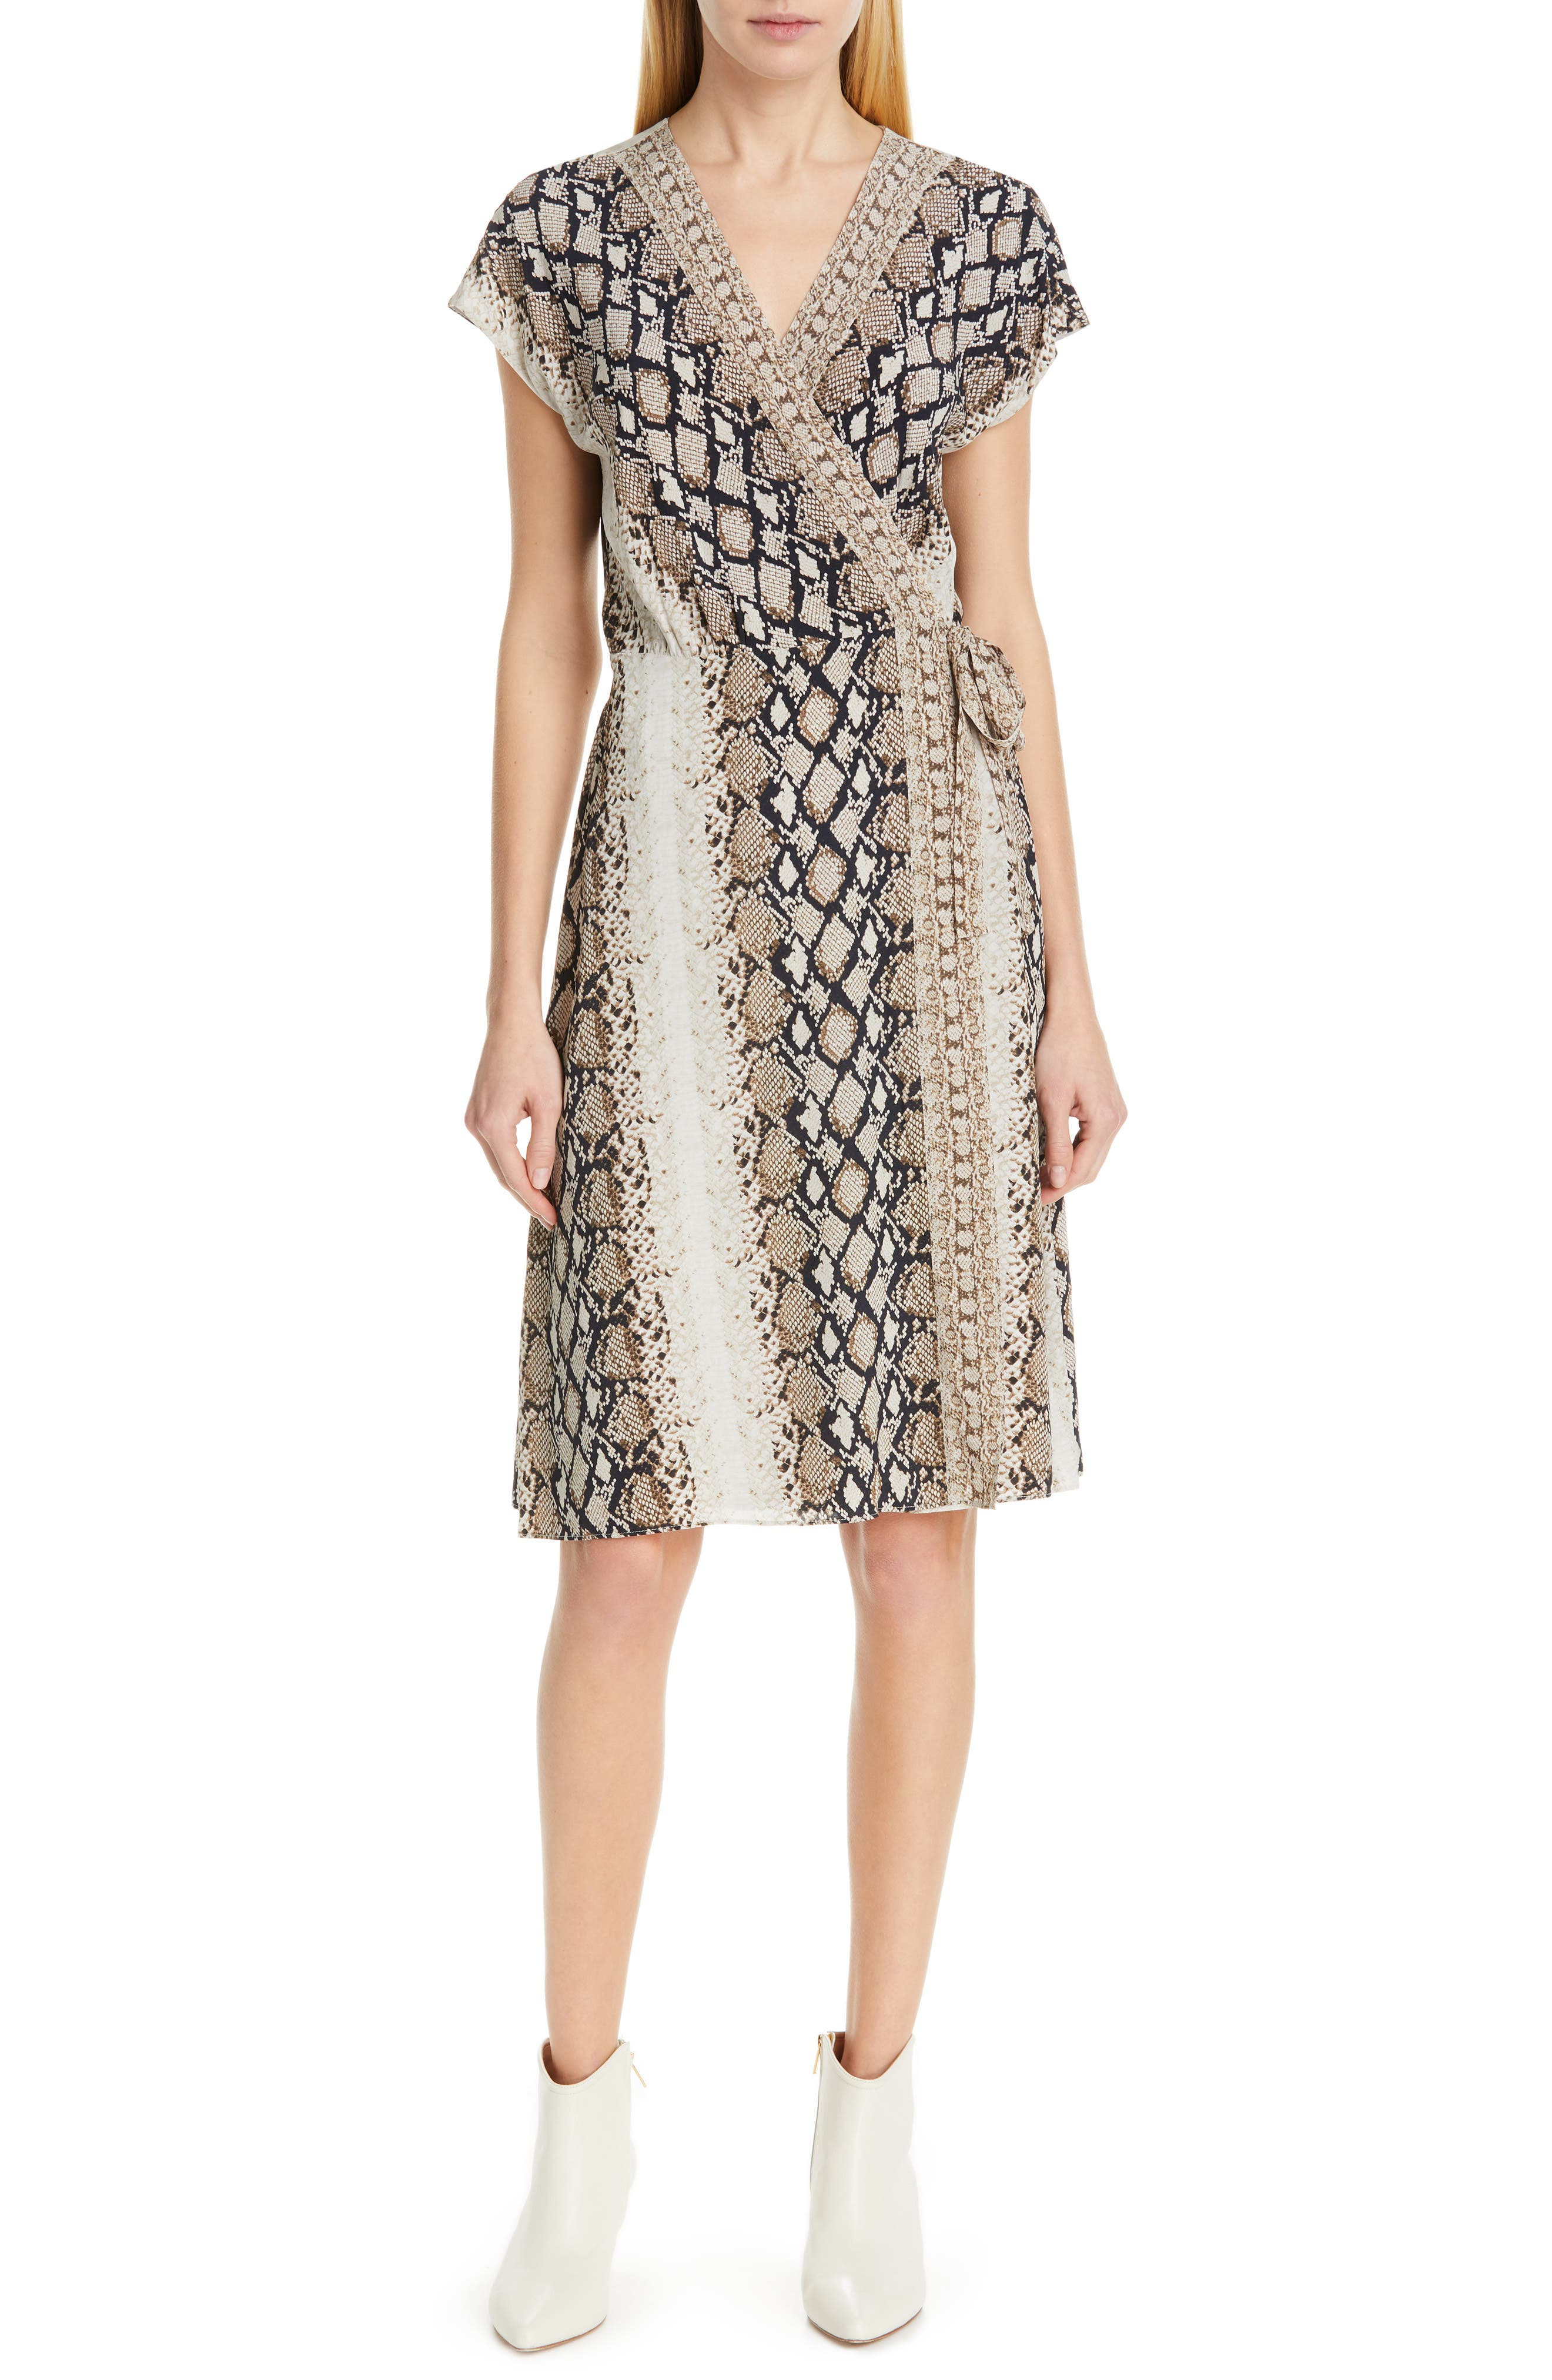 Joie Bethwyn C Snakeskin Print Wrap Style Dress, Ivory